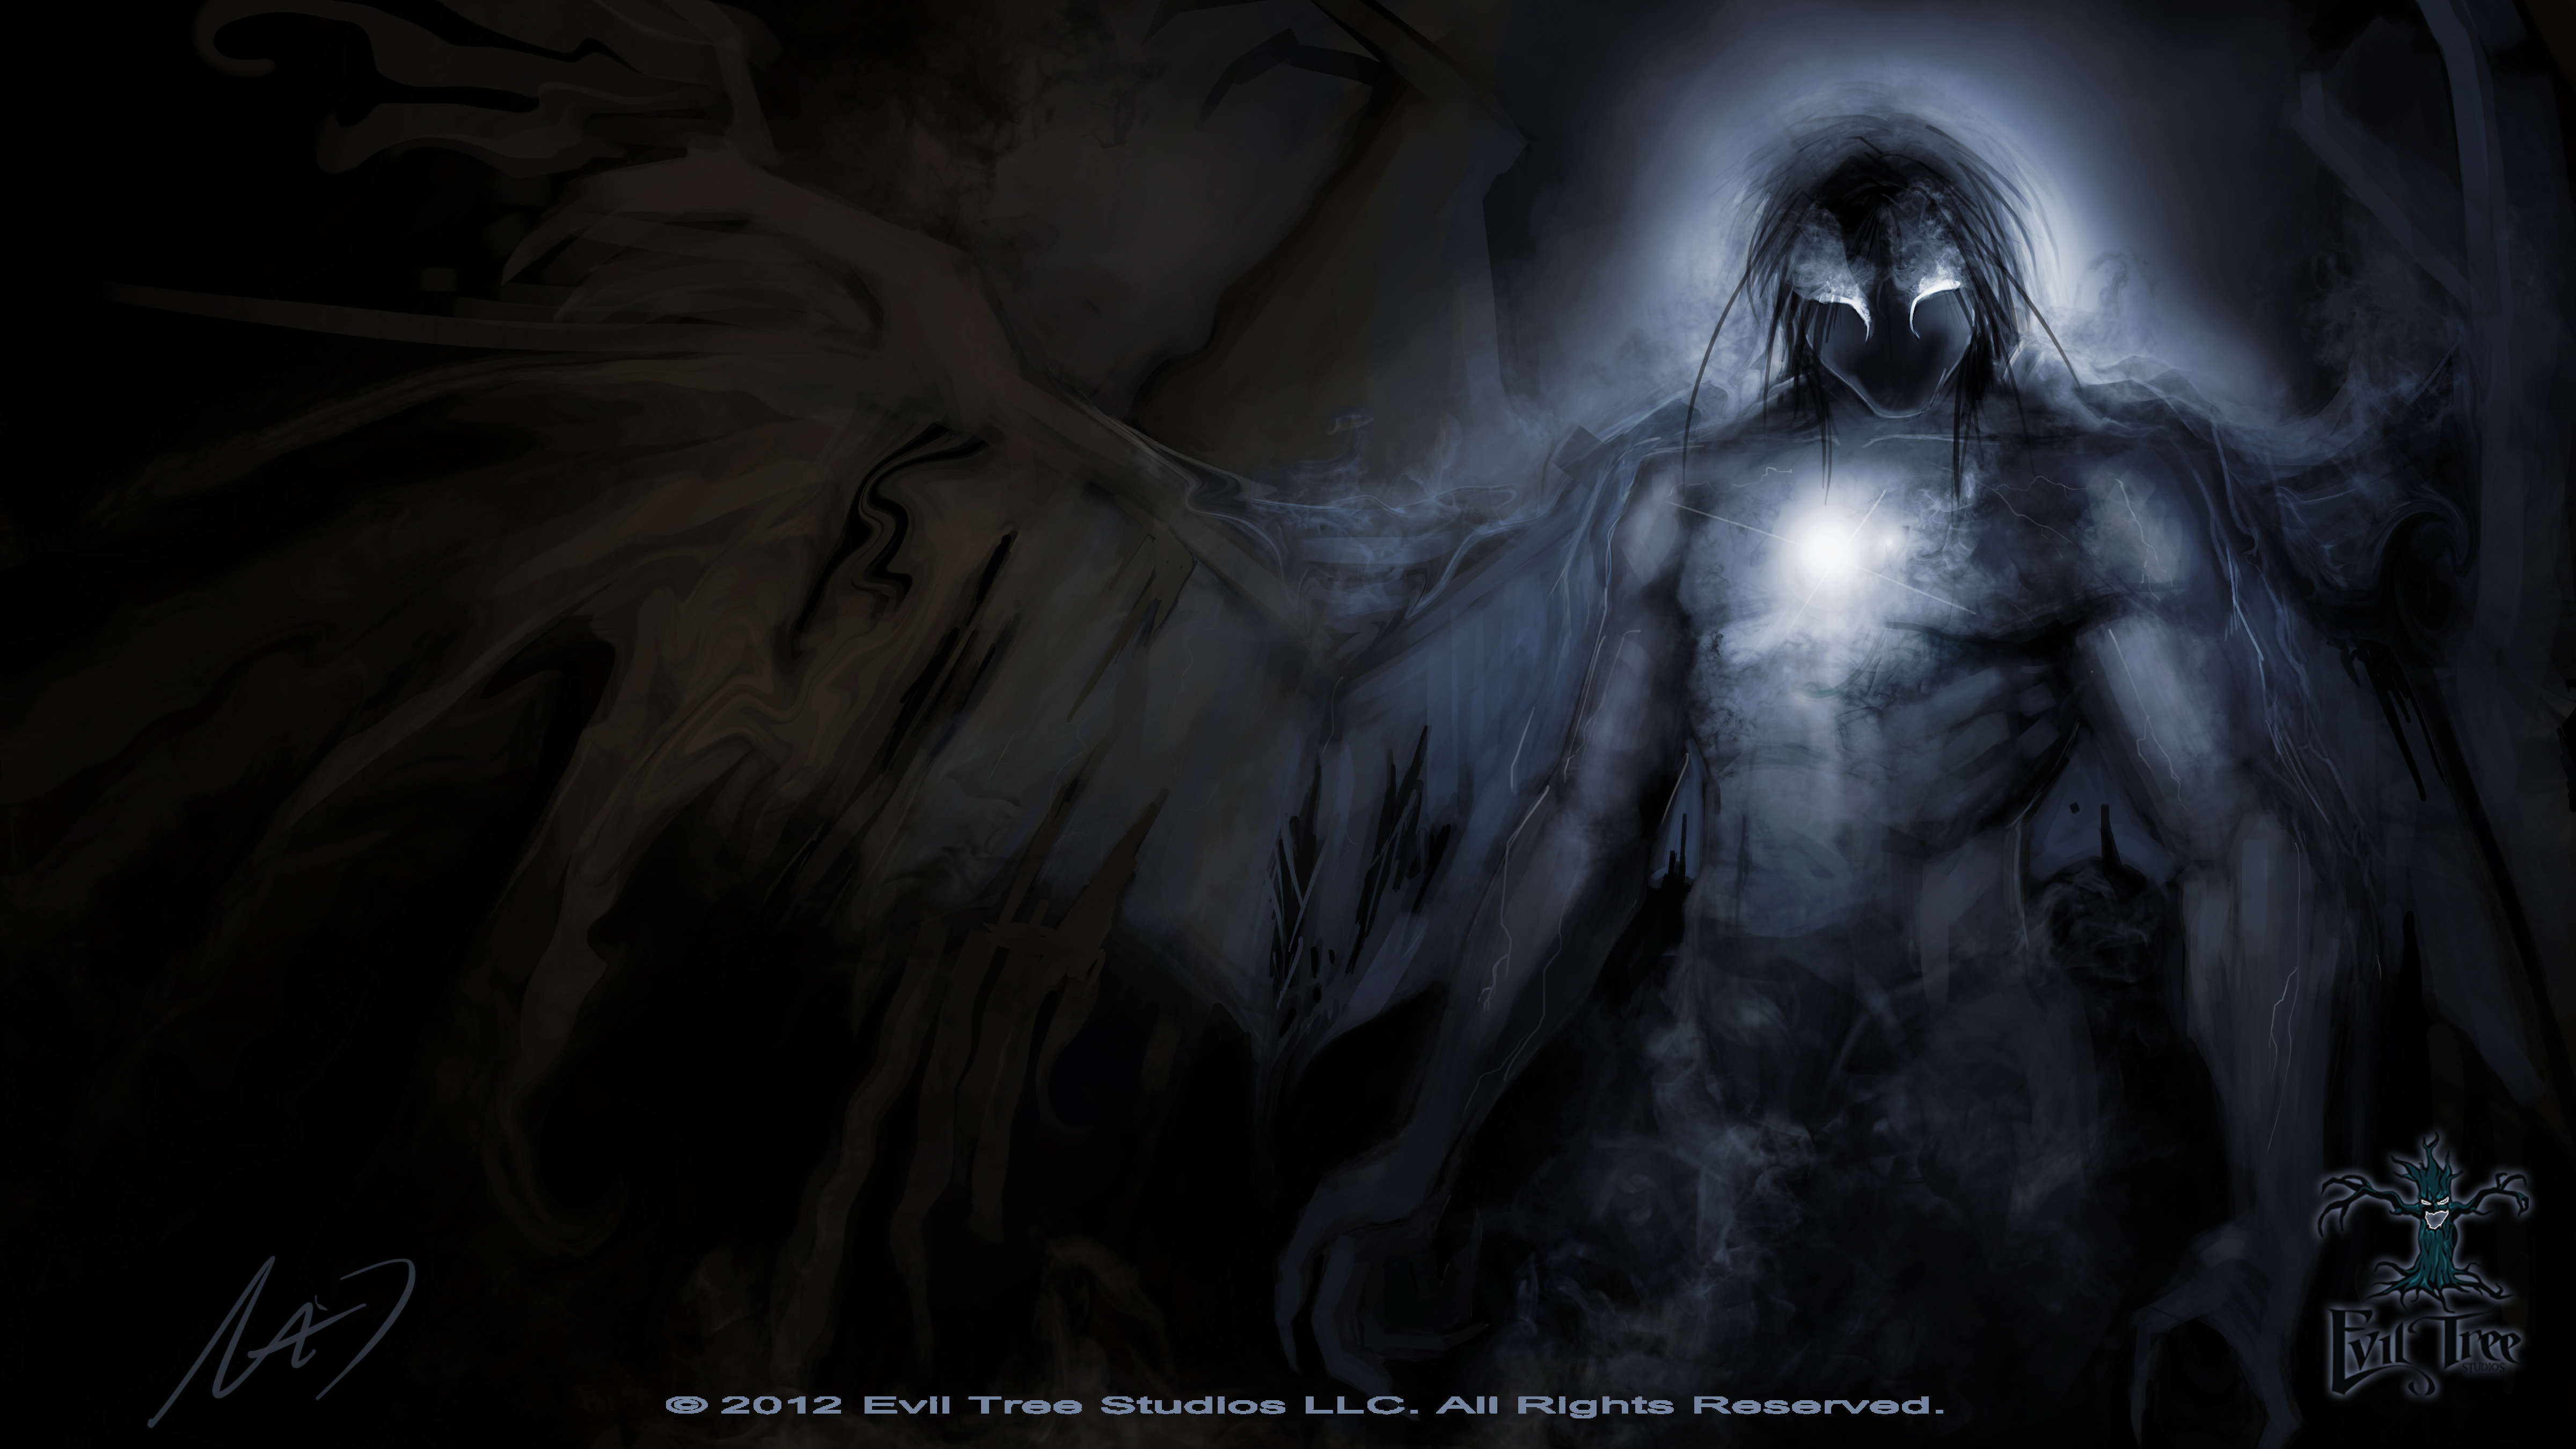 Hd wallpaper evil - Video Game Evil Tree Studios Dark Video Game Wallpaper